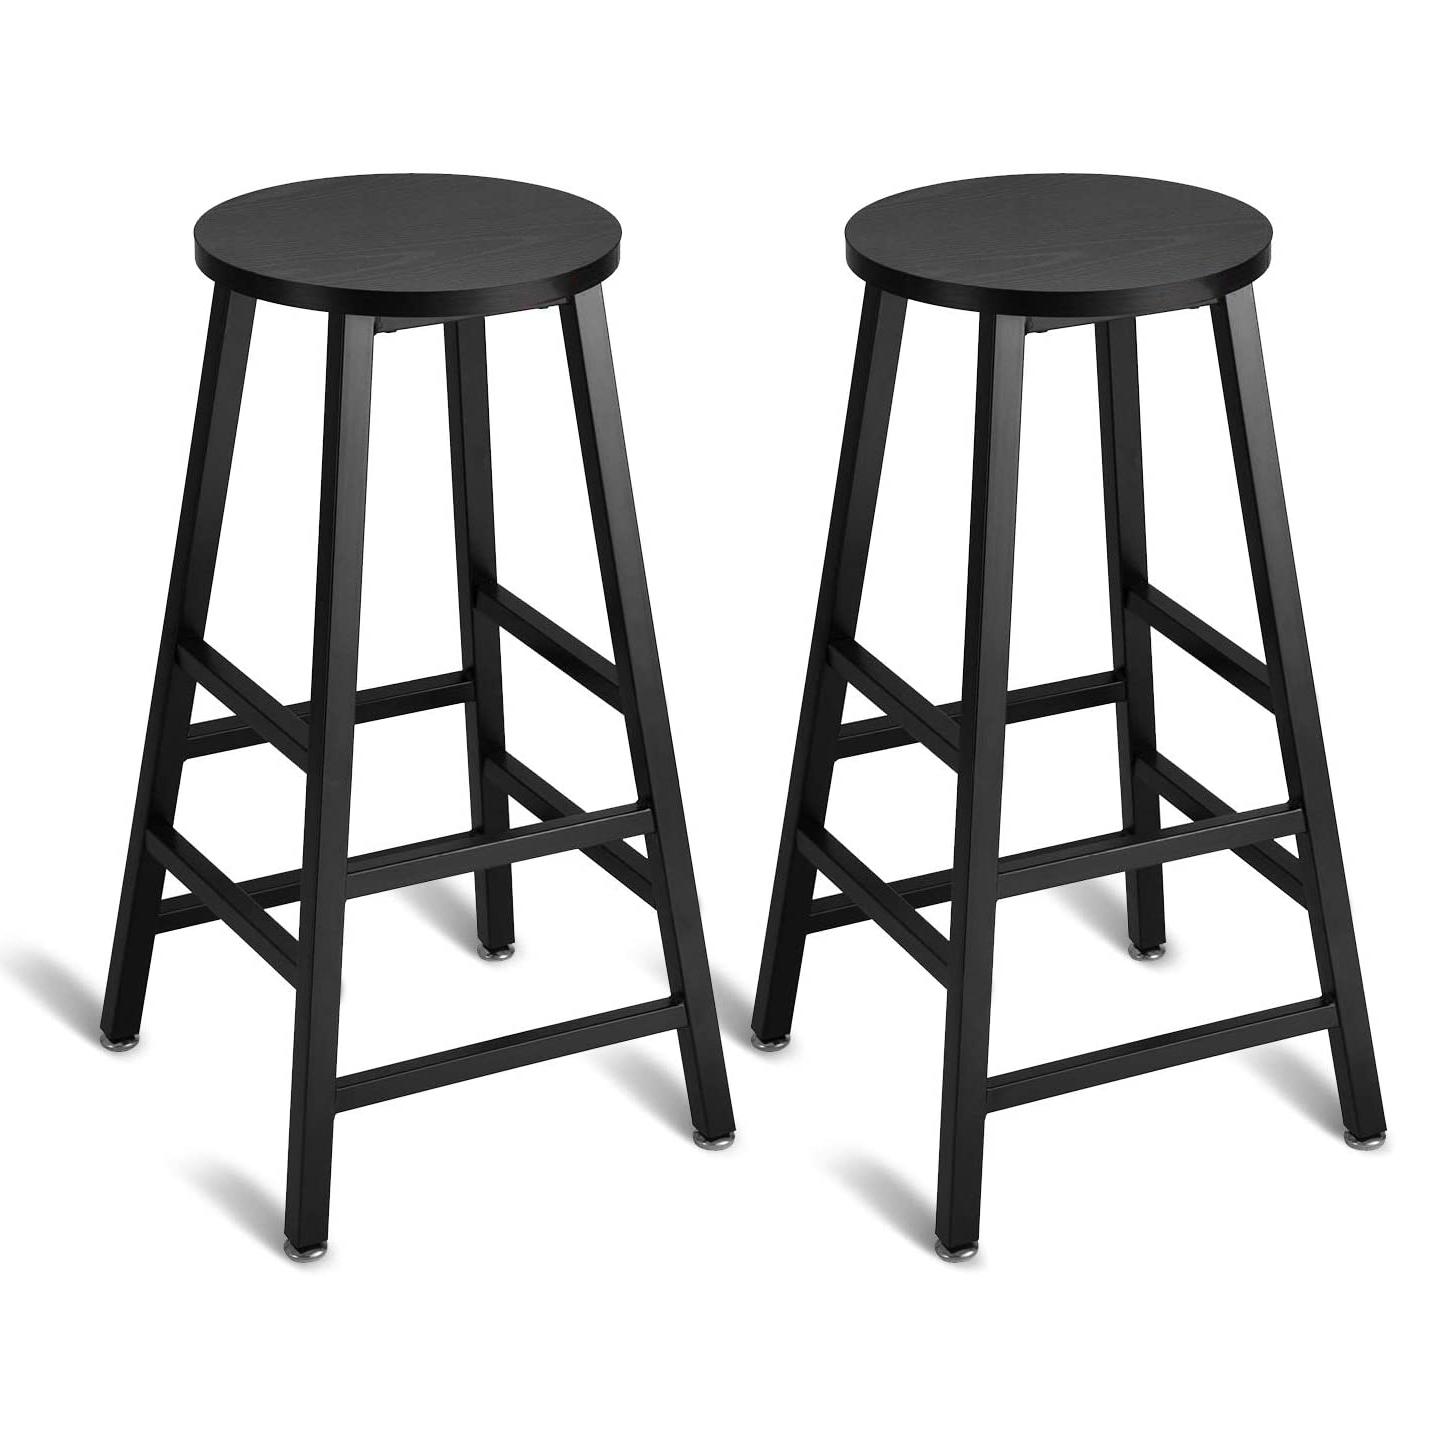 Bar Stools Set of 2 Rustic Bar Stool Dining Height Stools Bistro Vintage Stool